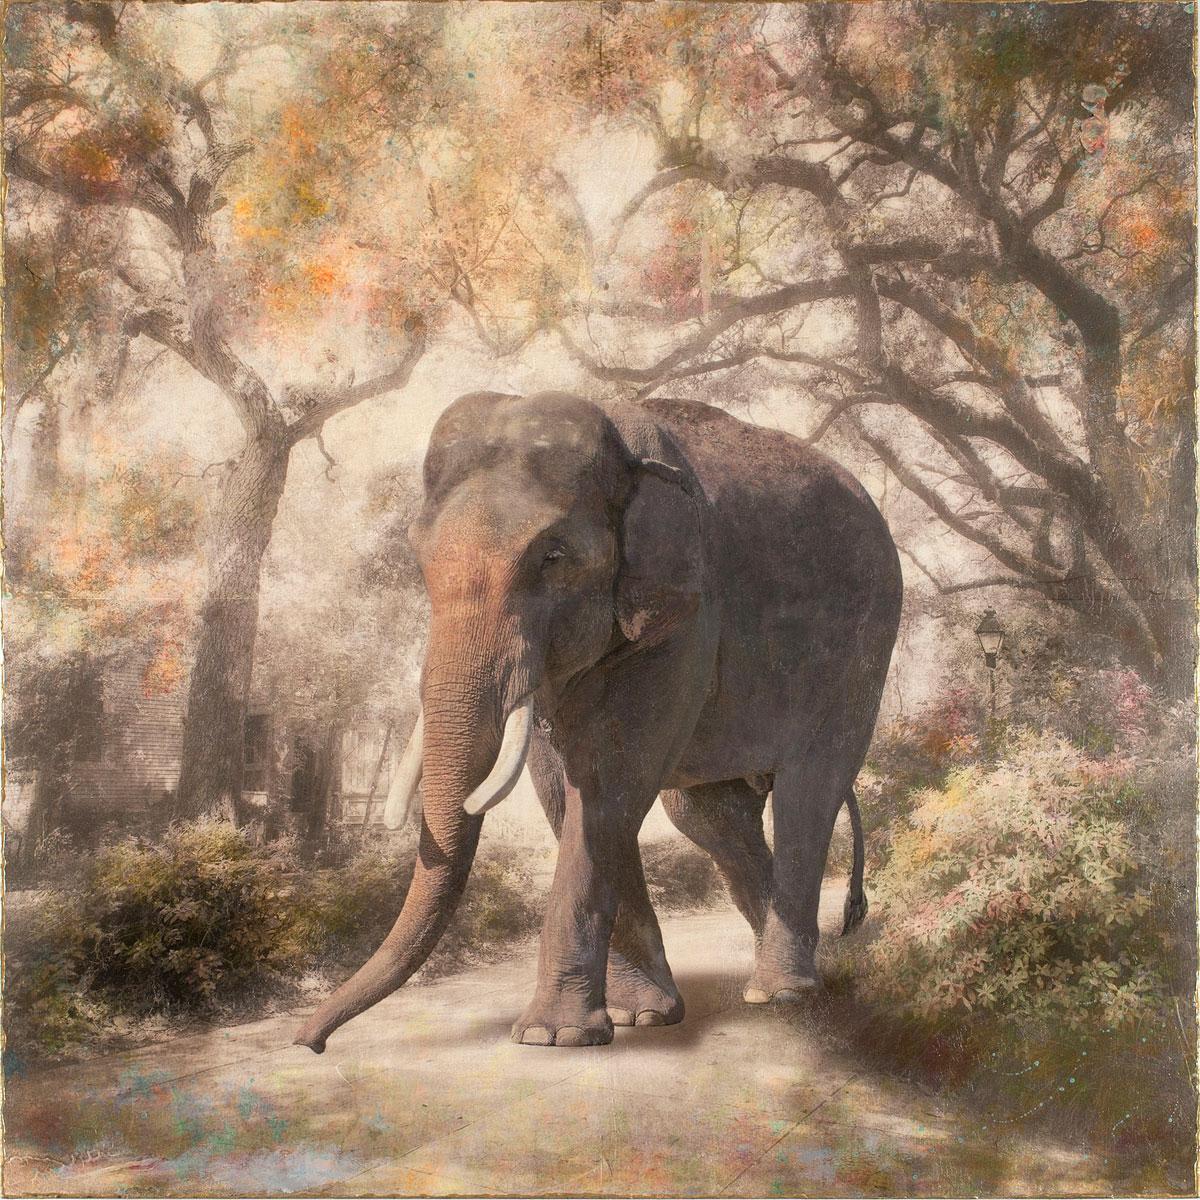 Savannah Stroll by Sondra Wampler